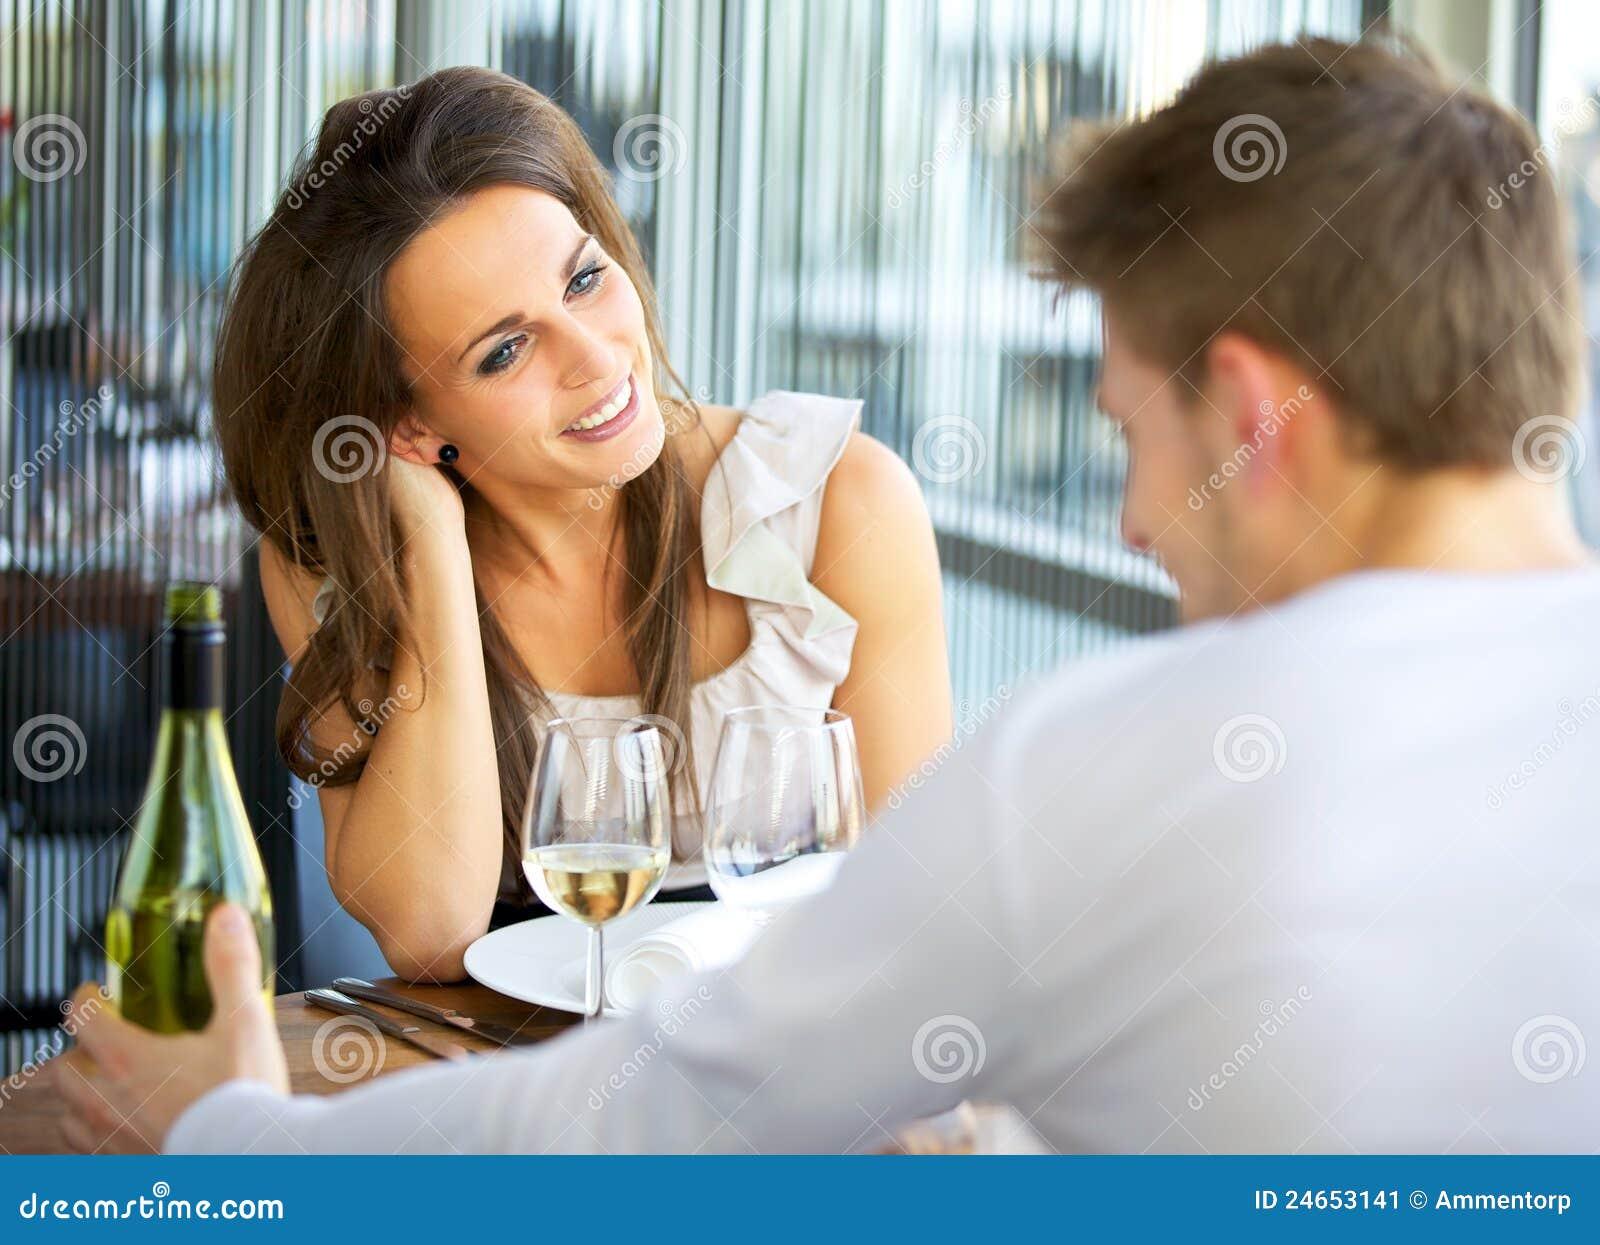 Photo Tips for Online Dating eHarmony Advice